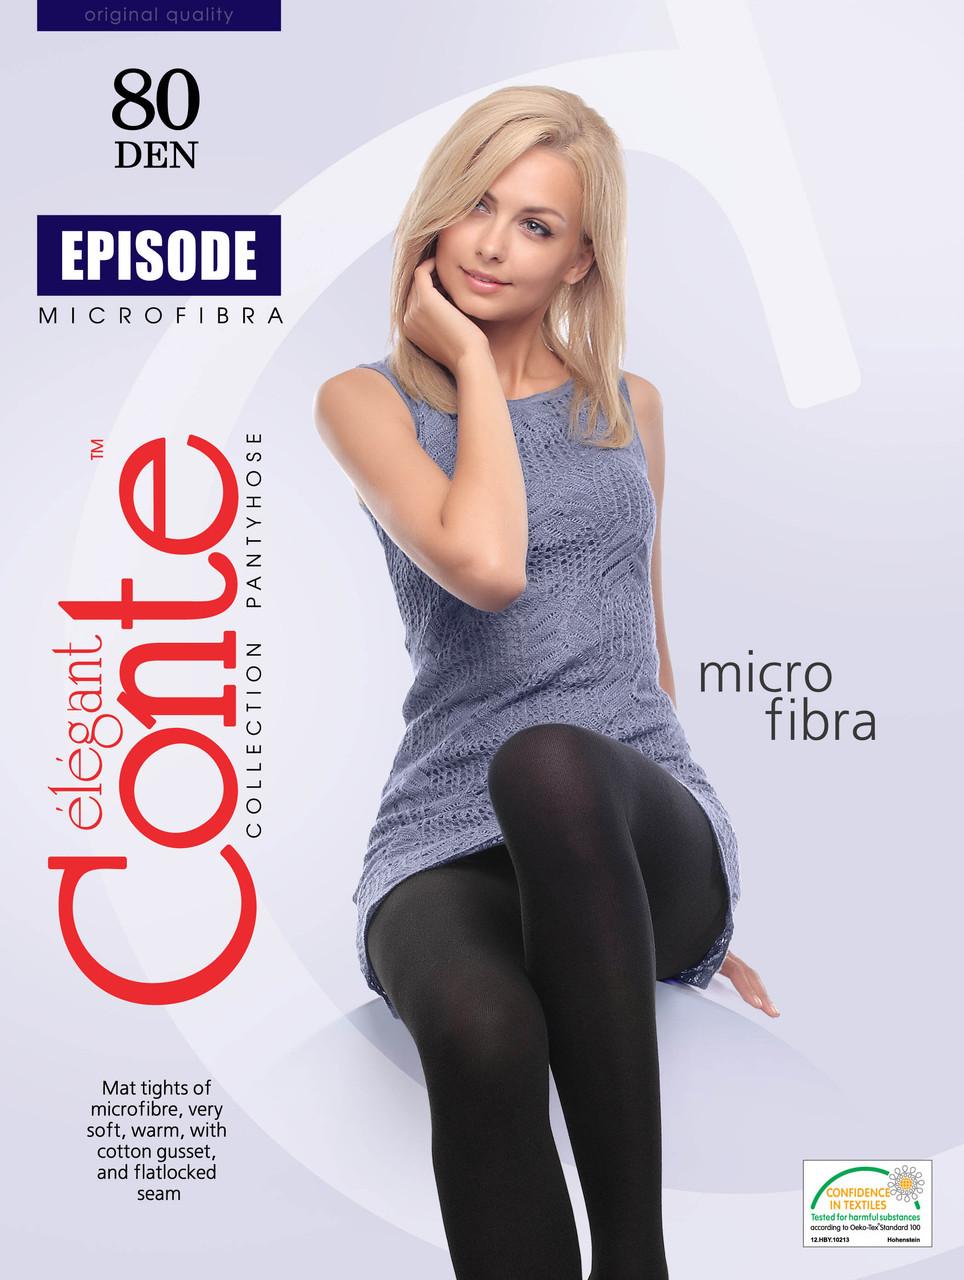 Колготки жіночі Conte Episode 80 Den (Конте Епізод 80 ден), розмір 5, 6 Білорусія